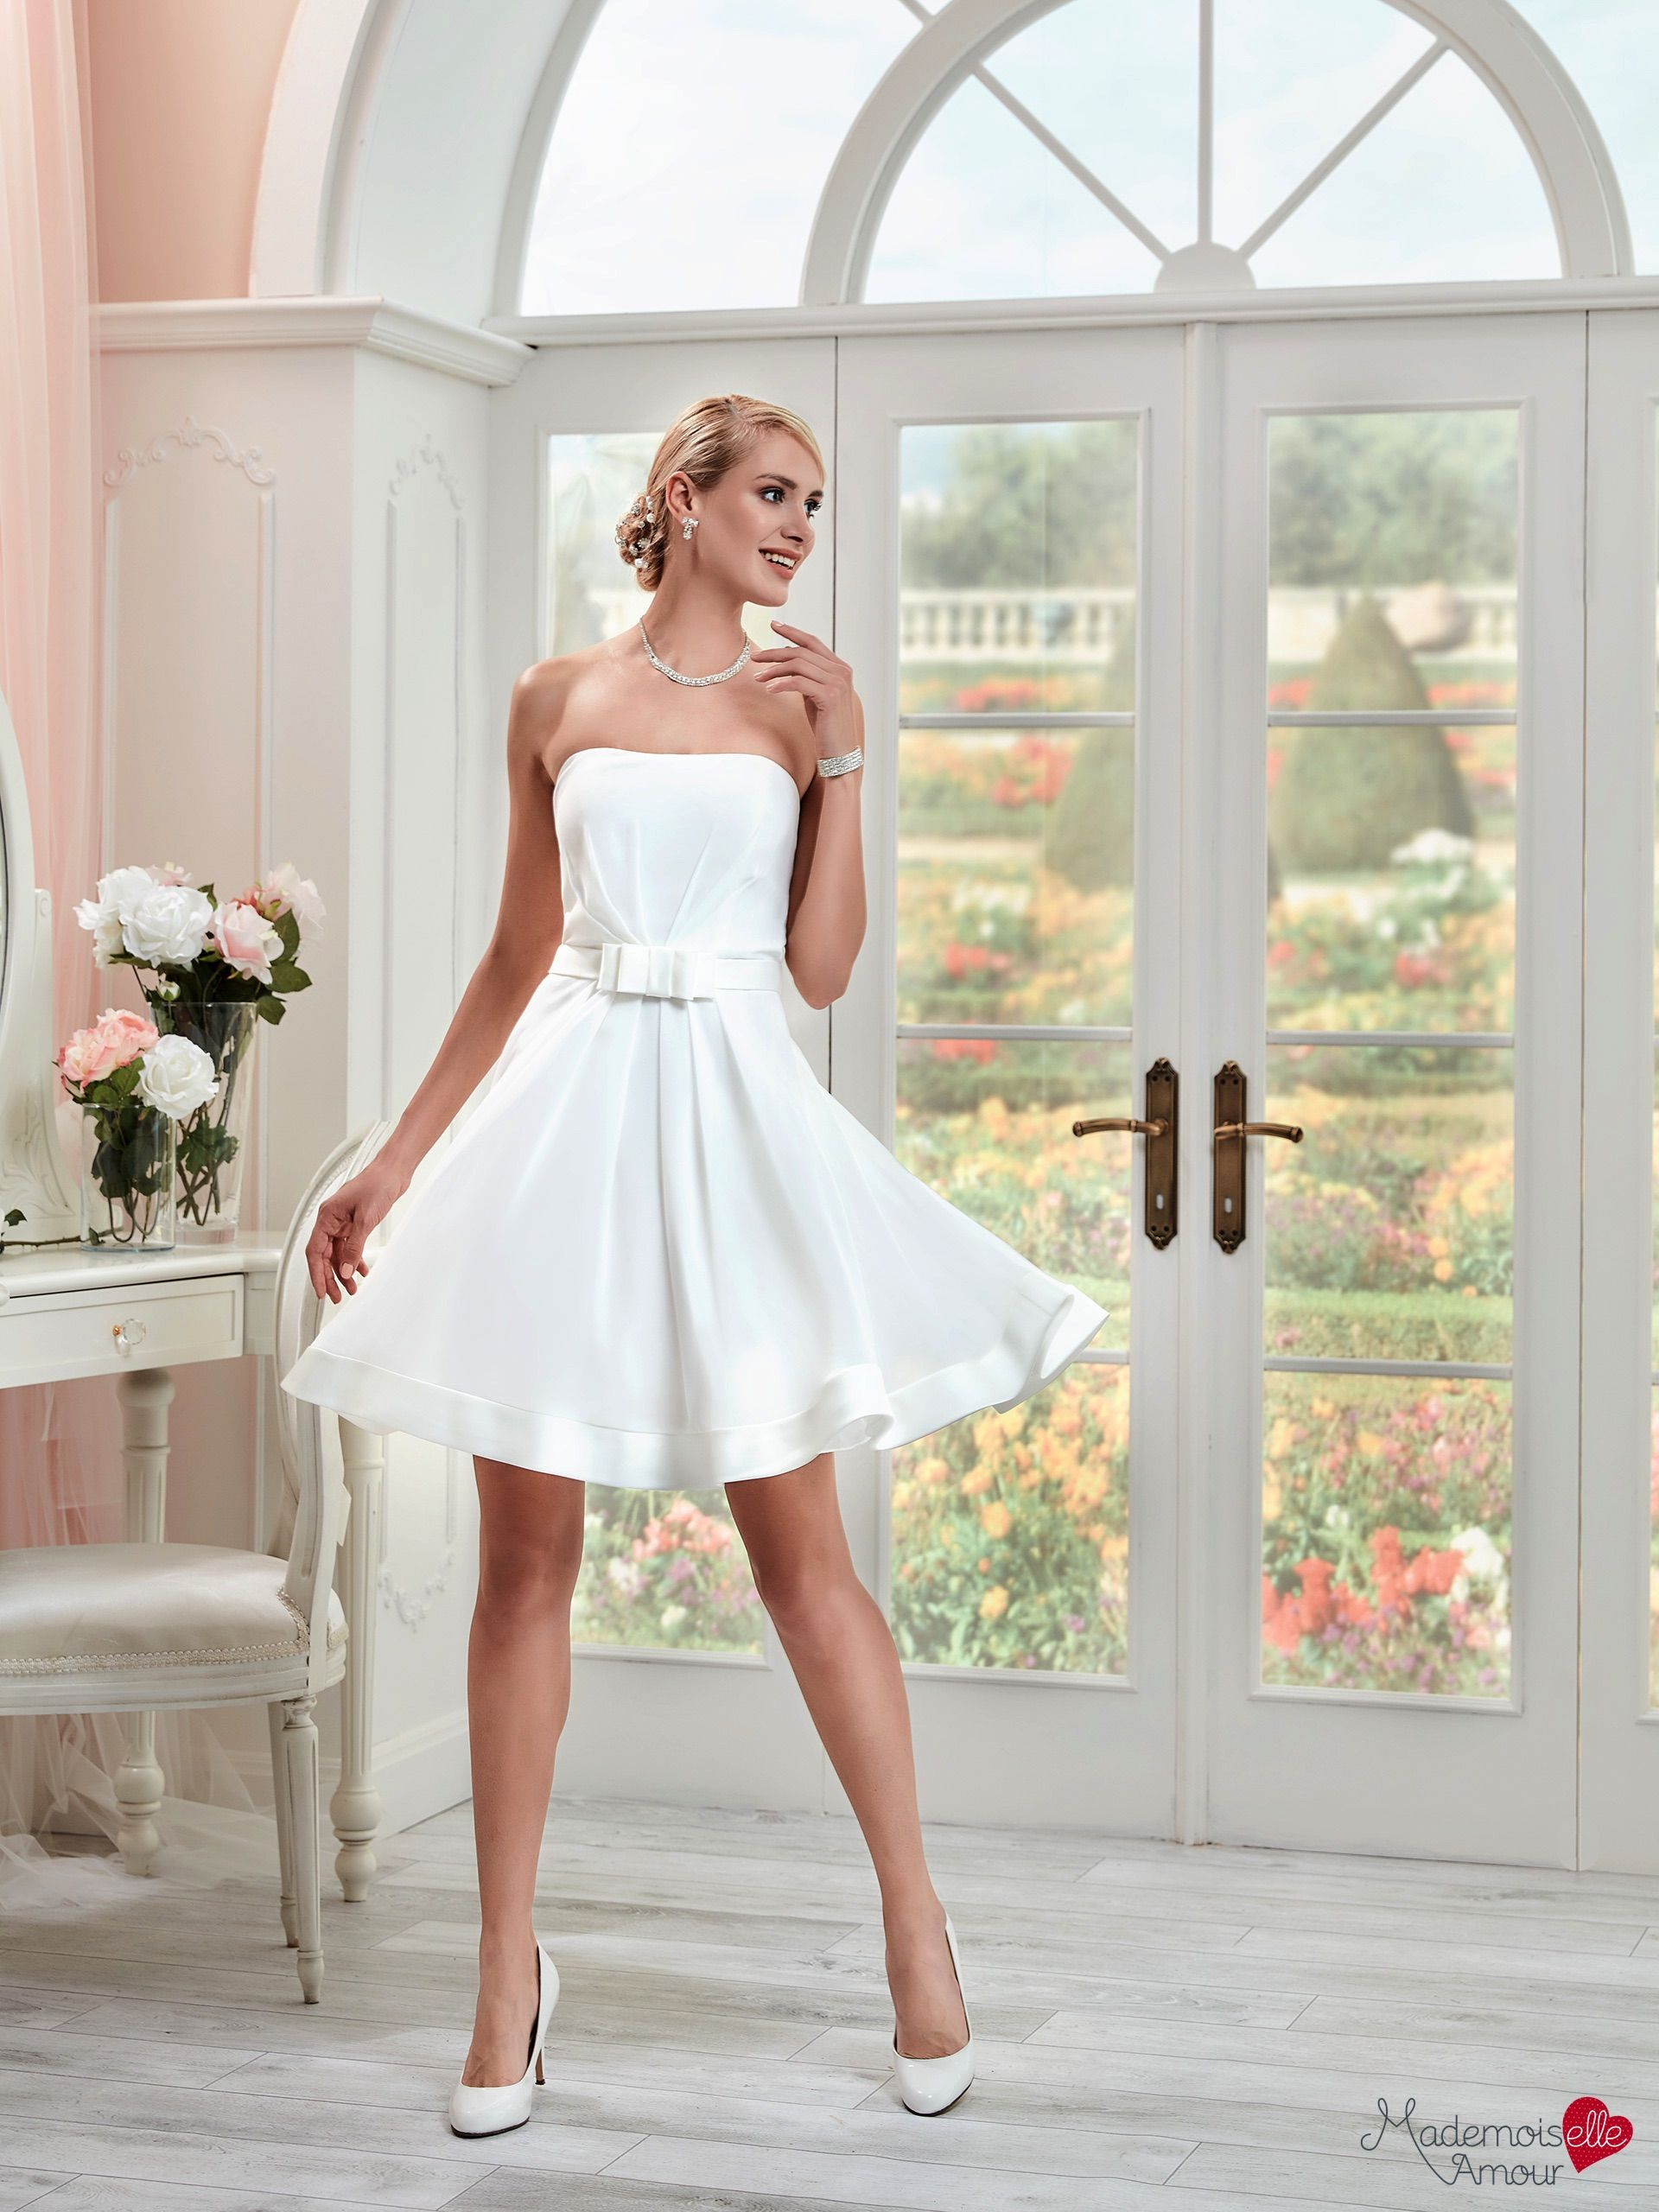 robe de mari e courte robe de mariage volume l ger robe de mari e mlle maui collection. Black Bedroom Furniture Sets. Home Design Ideas